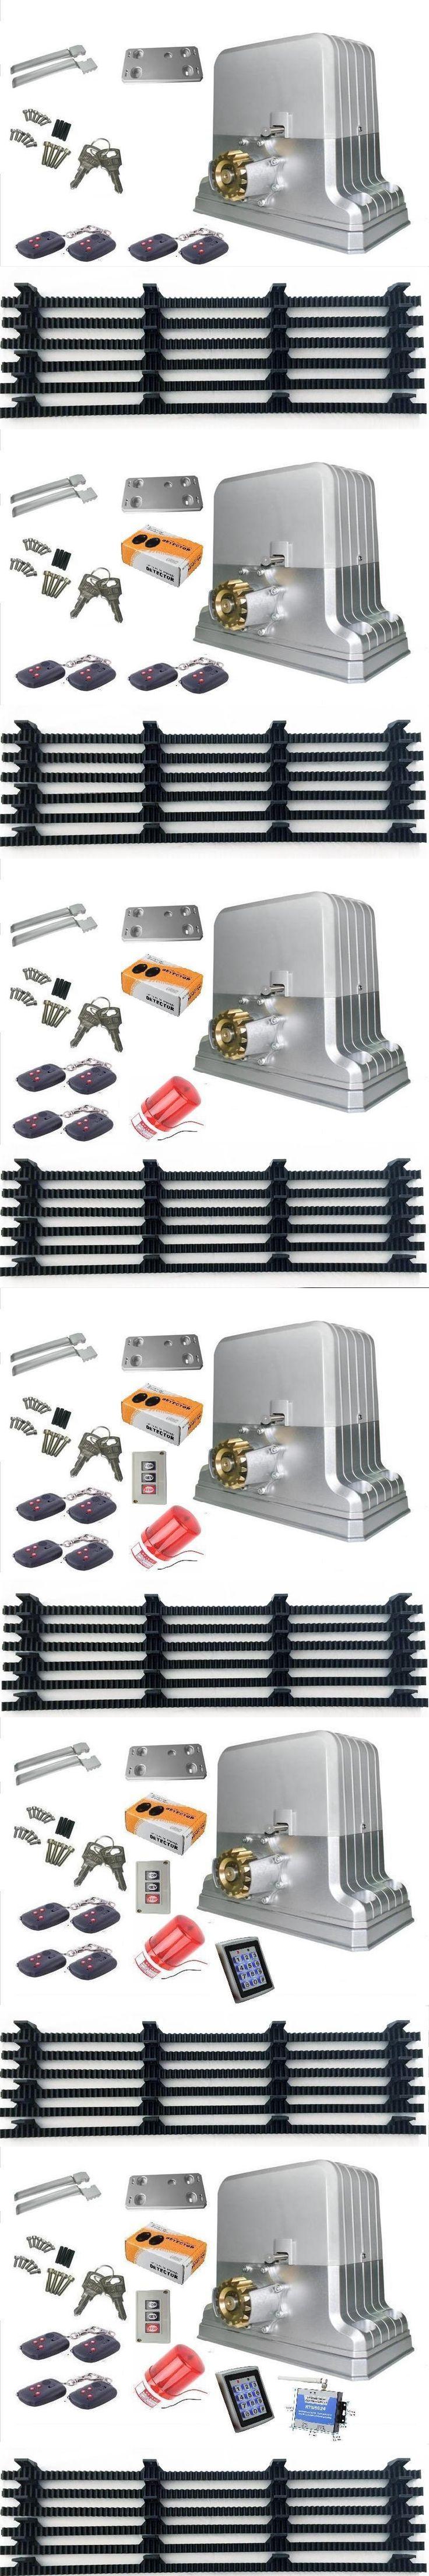 heavy duty 2800lbs 1500kg electric sliding gate motors/automatic gate opener engine 6m racks 1photocel(GSM/RFID keypad optional)